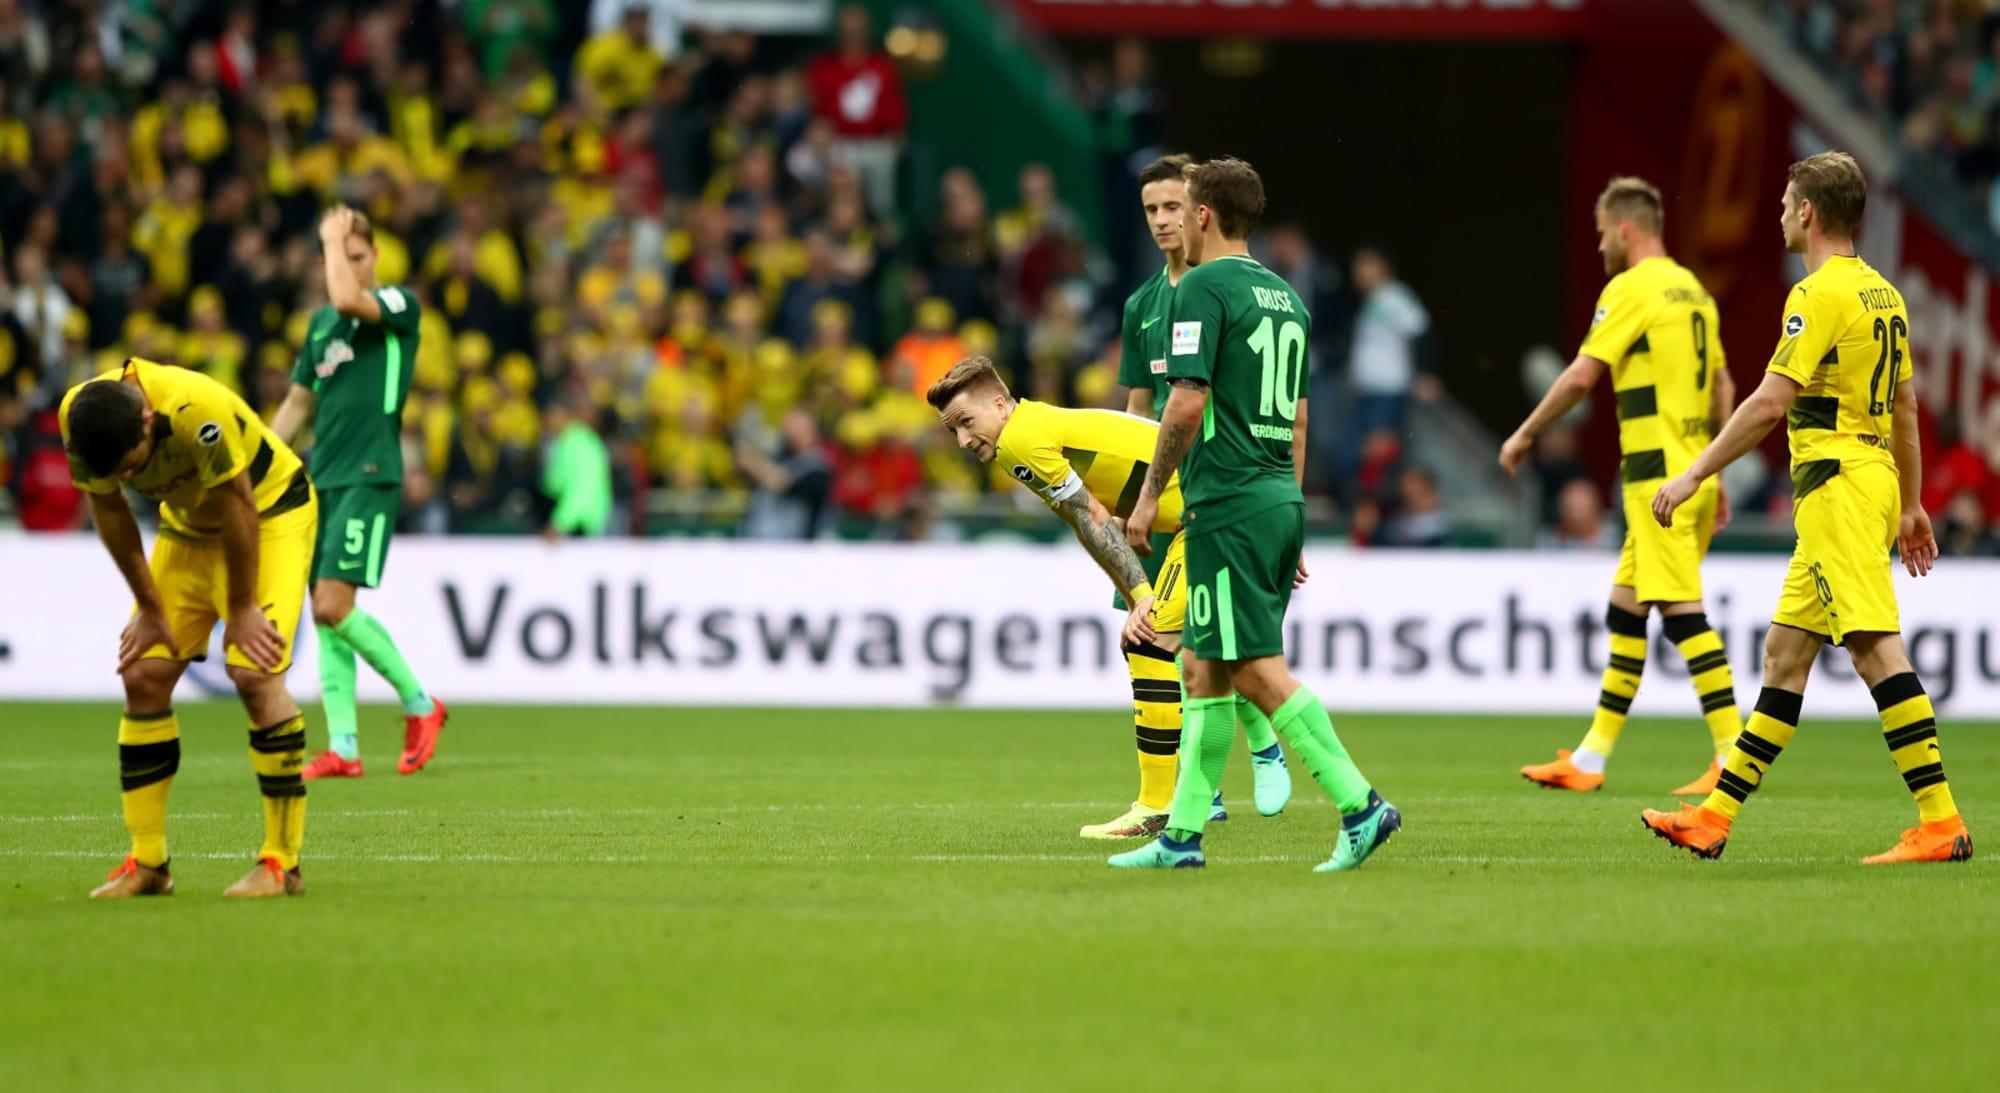 Player Ratings Wasteful Borussia Dortmund Held By Werder